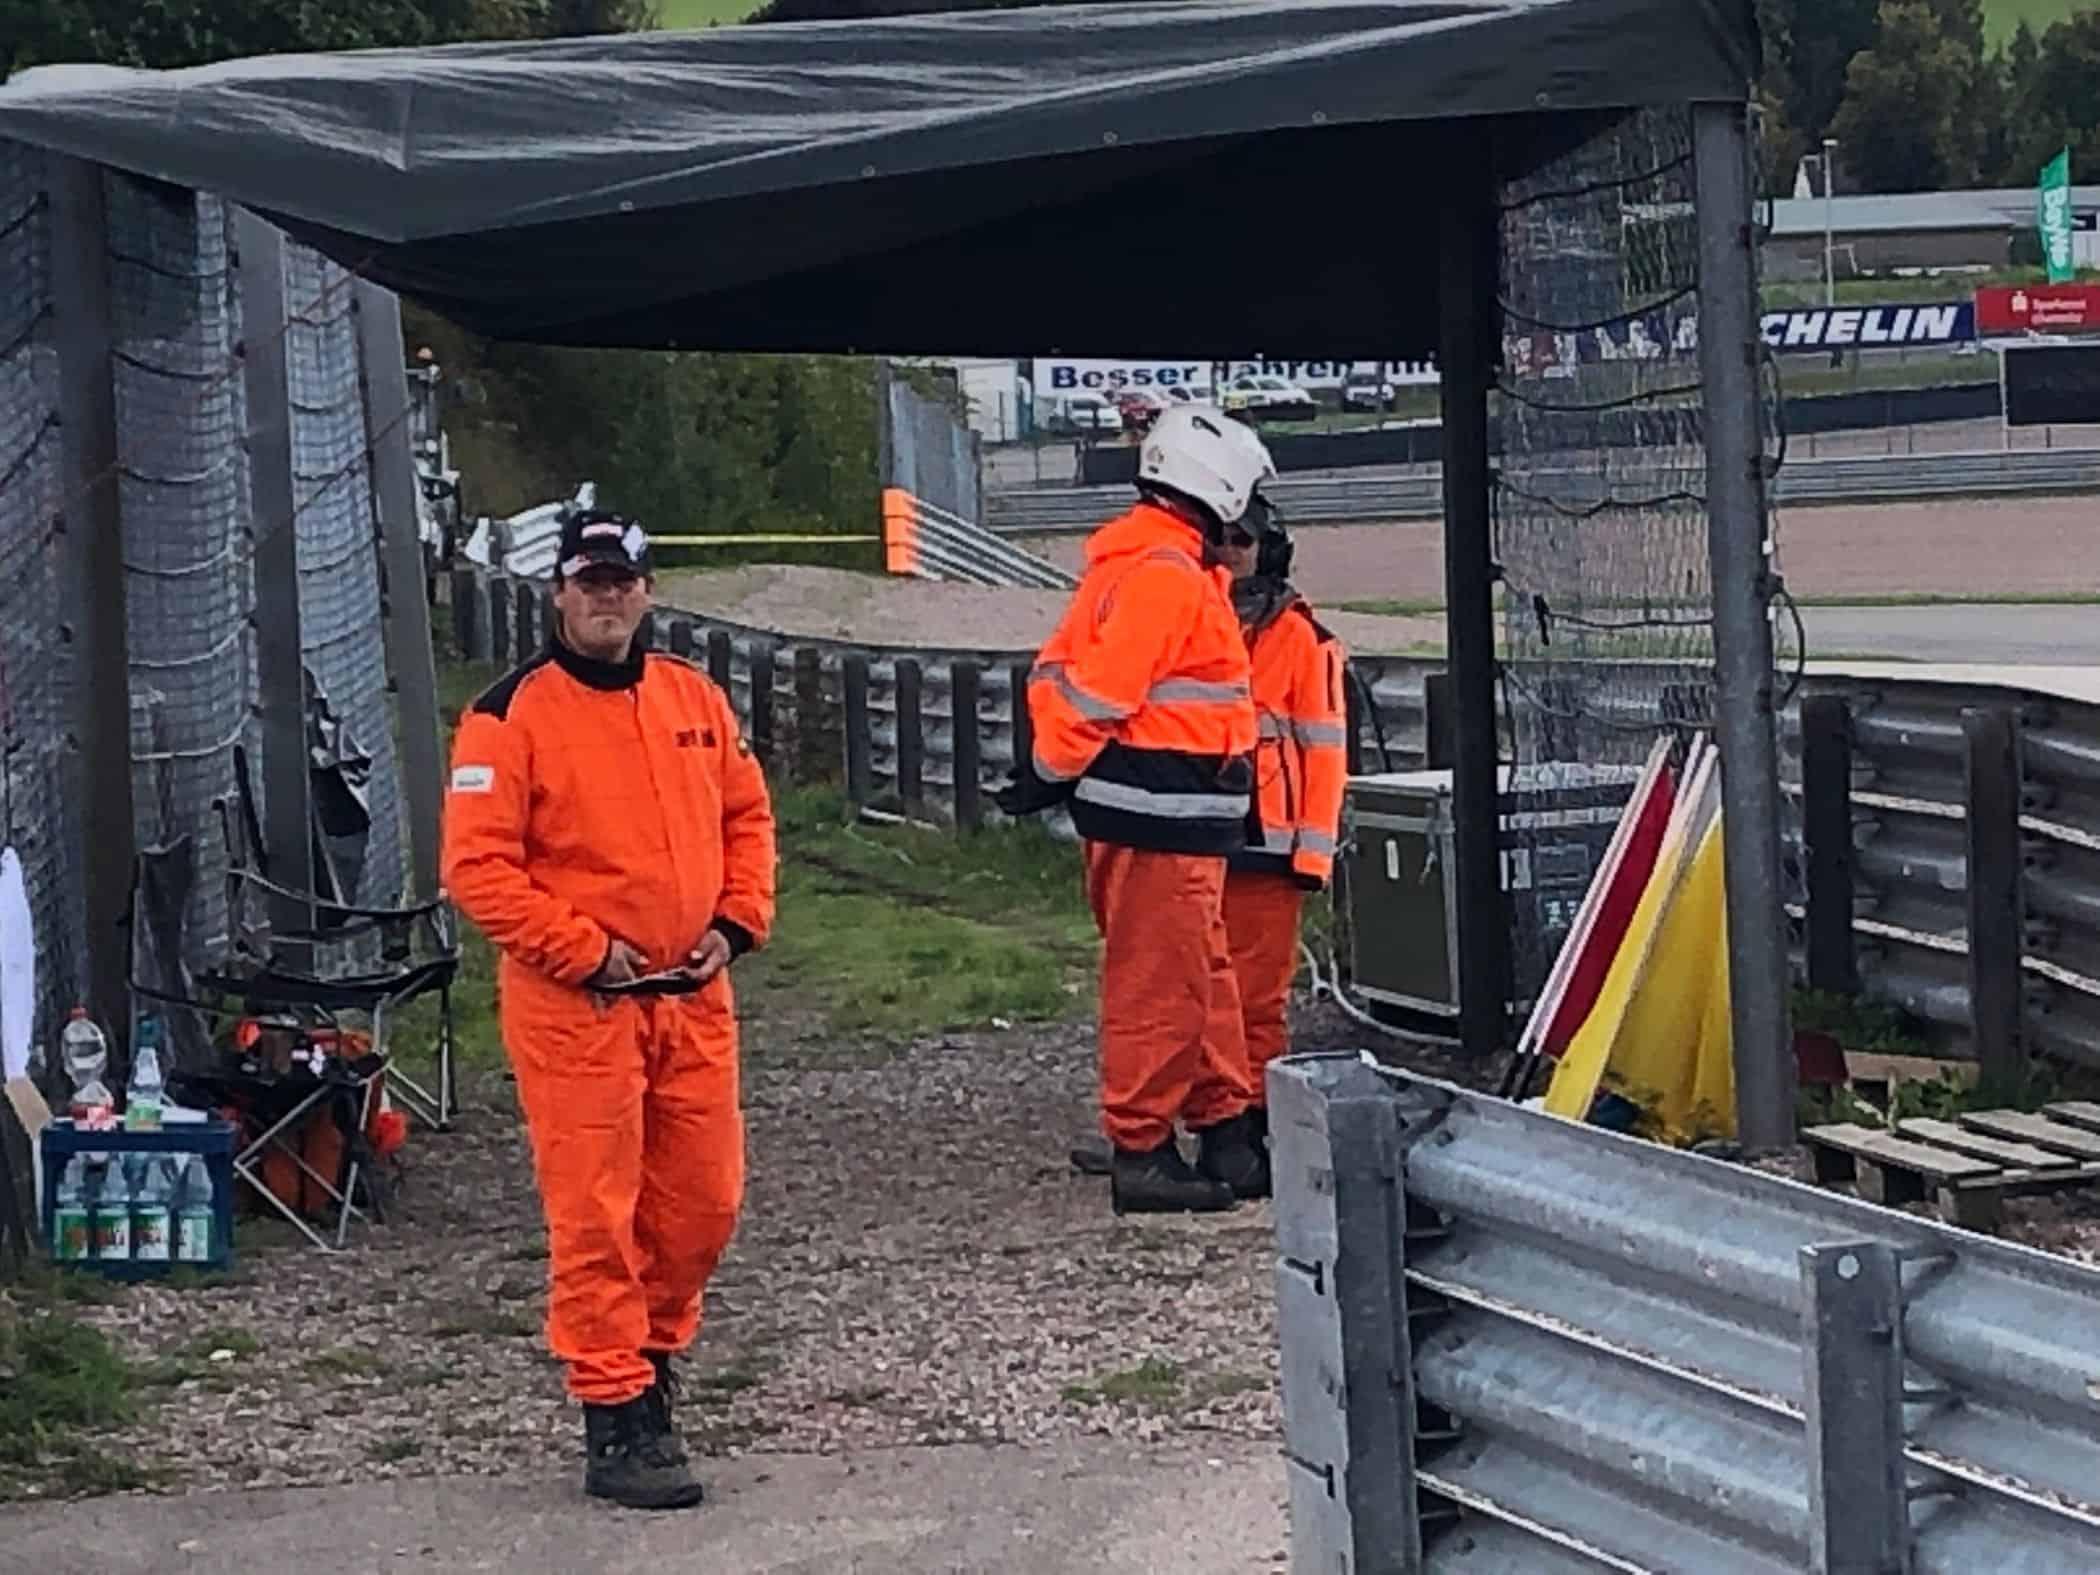 2019 ADAC TCR Germany - Saisonfinale auf dem Sachsenring